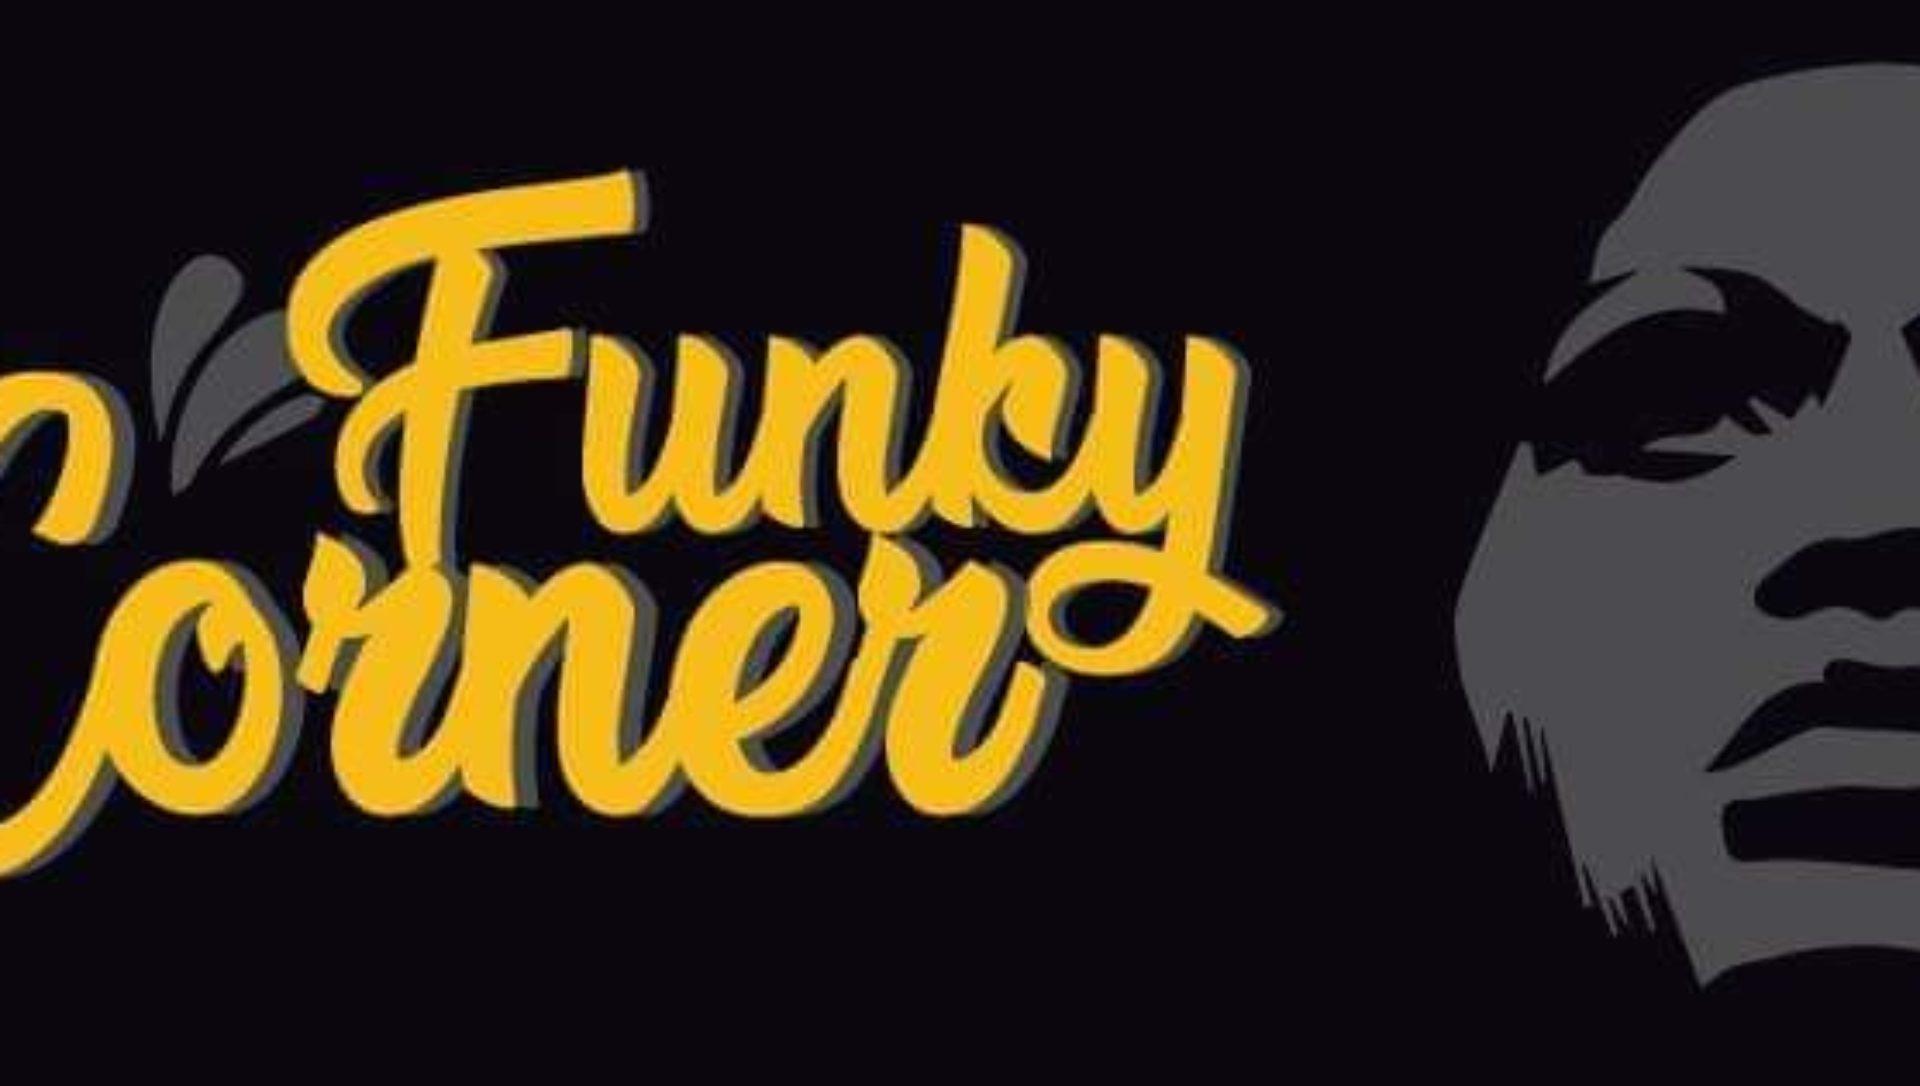 Funky Corner 1 on 1 Contest